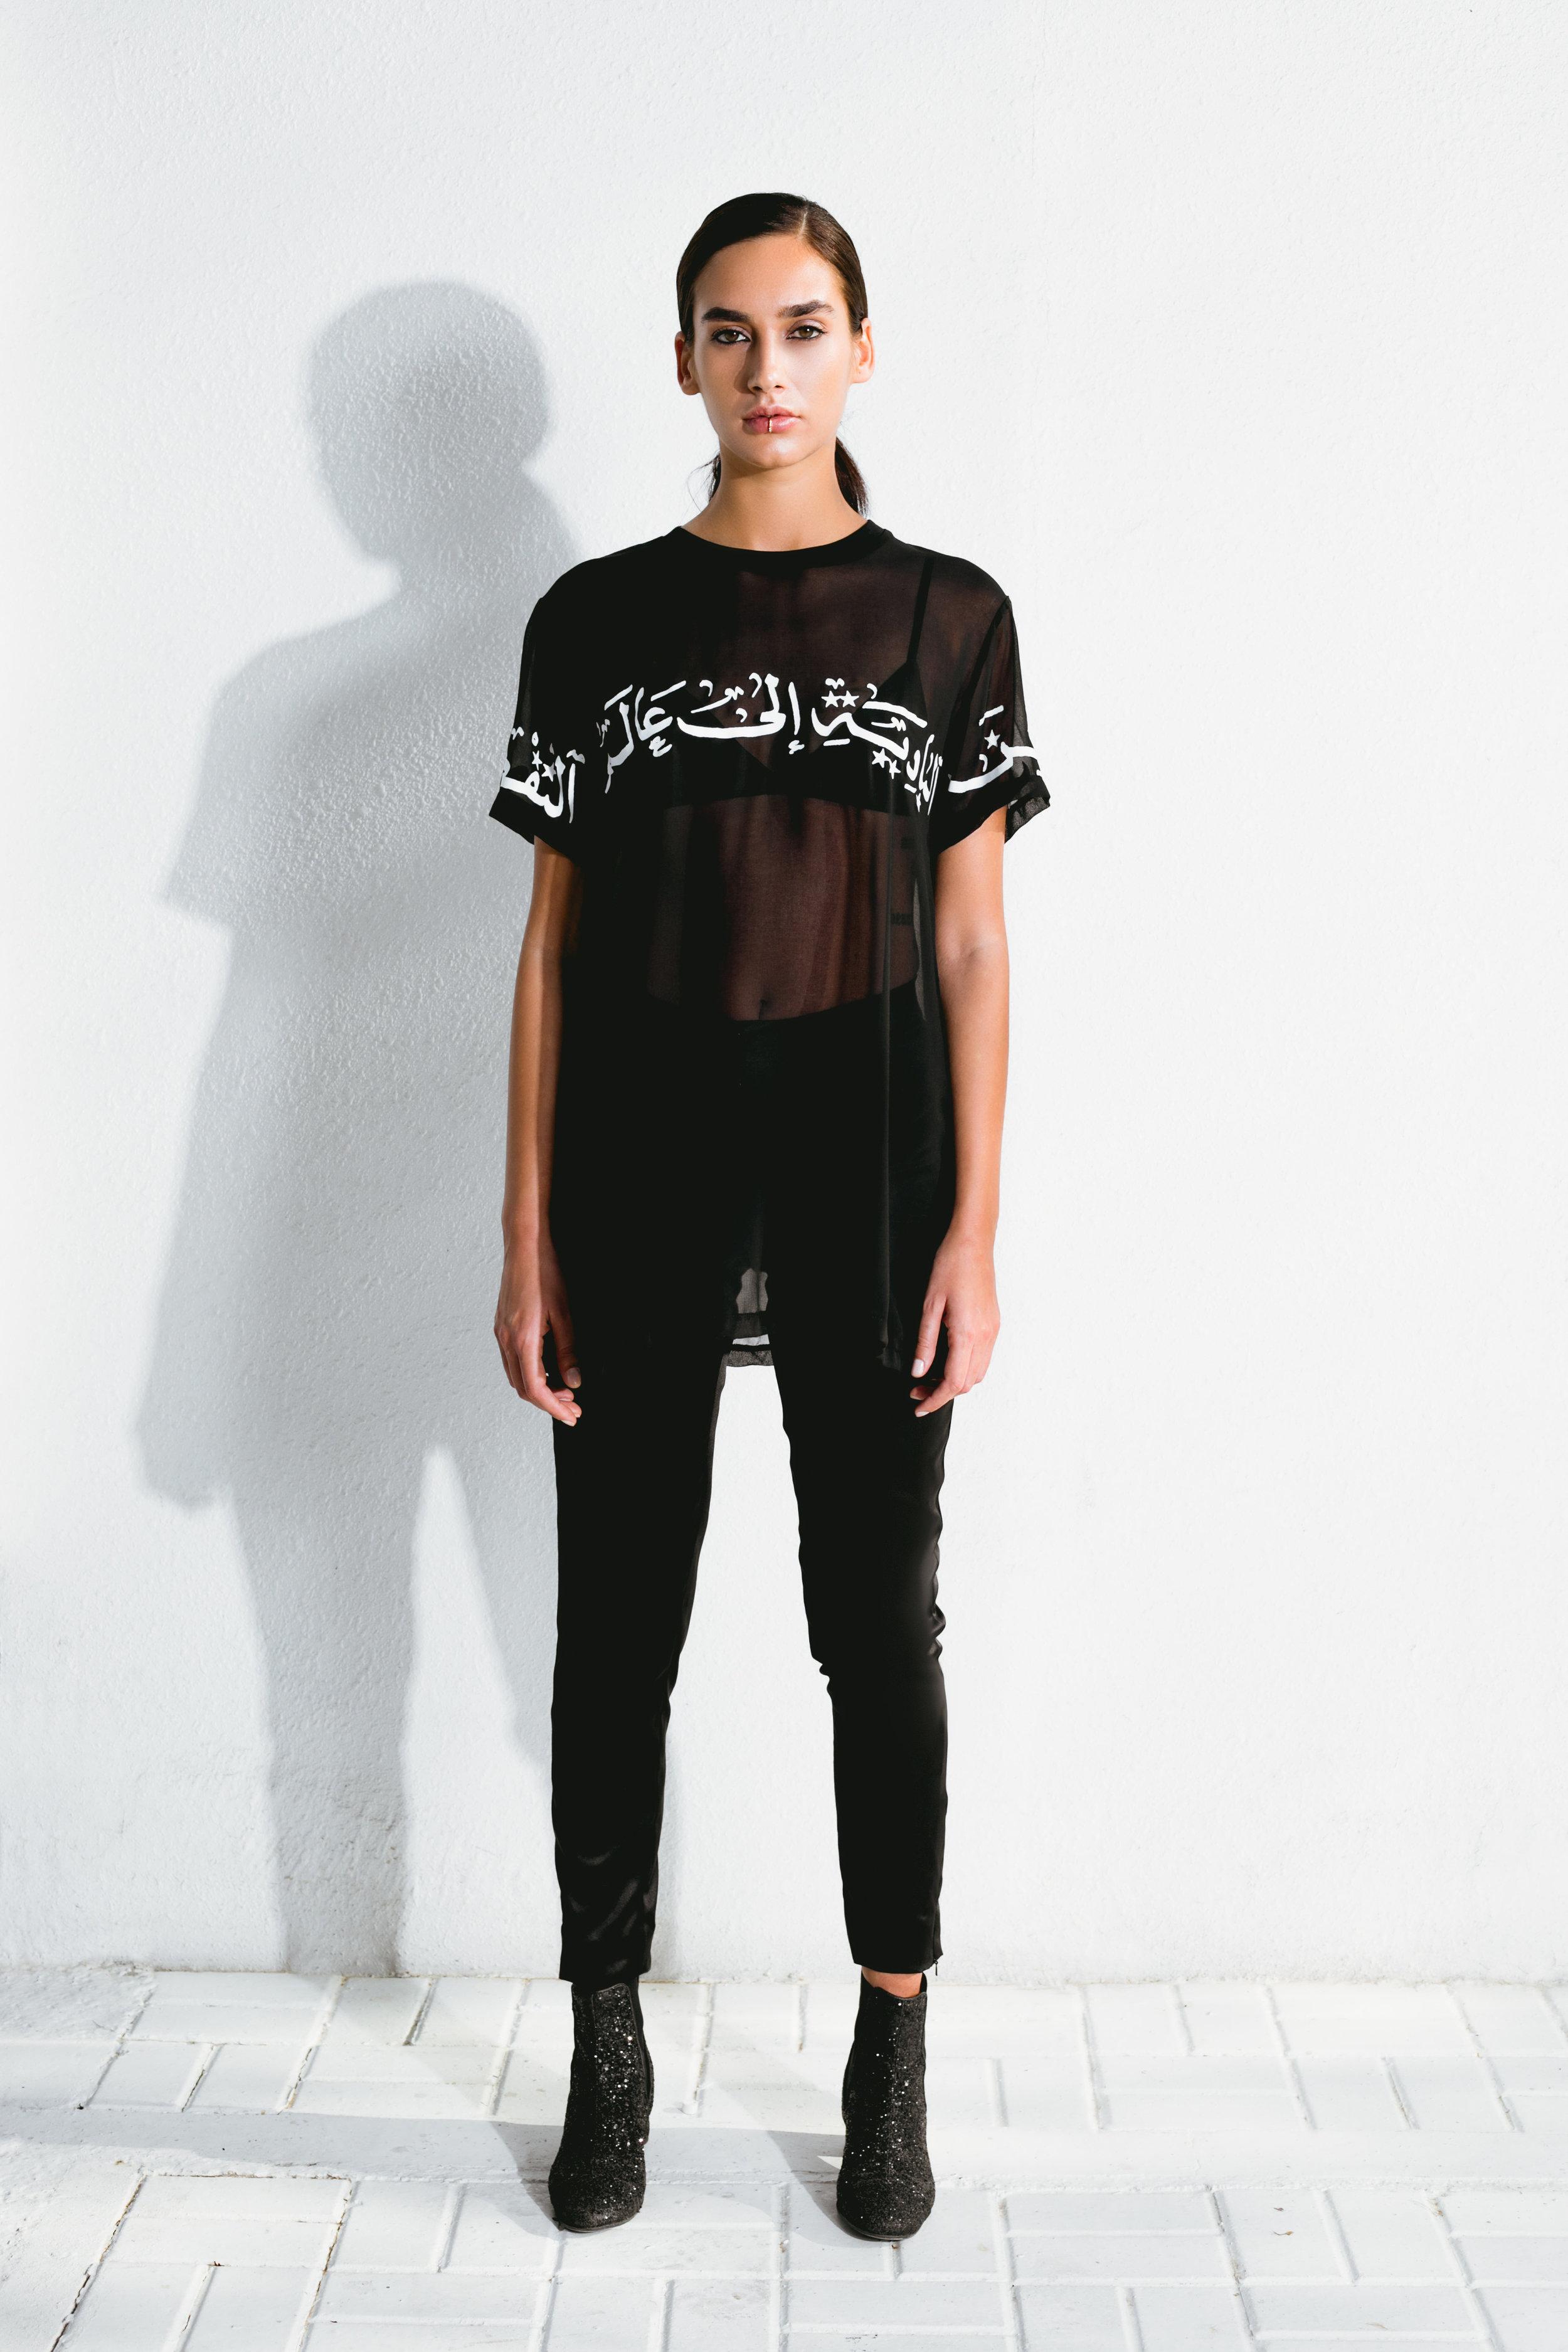 the arabian dream t-shirt & black satin pants